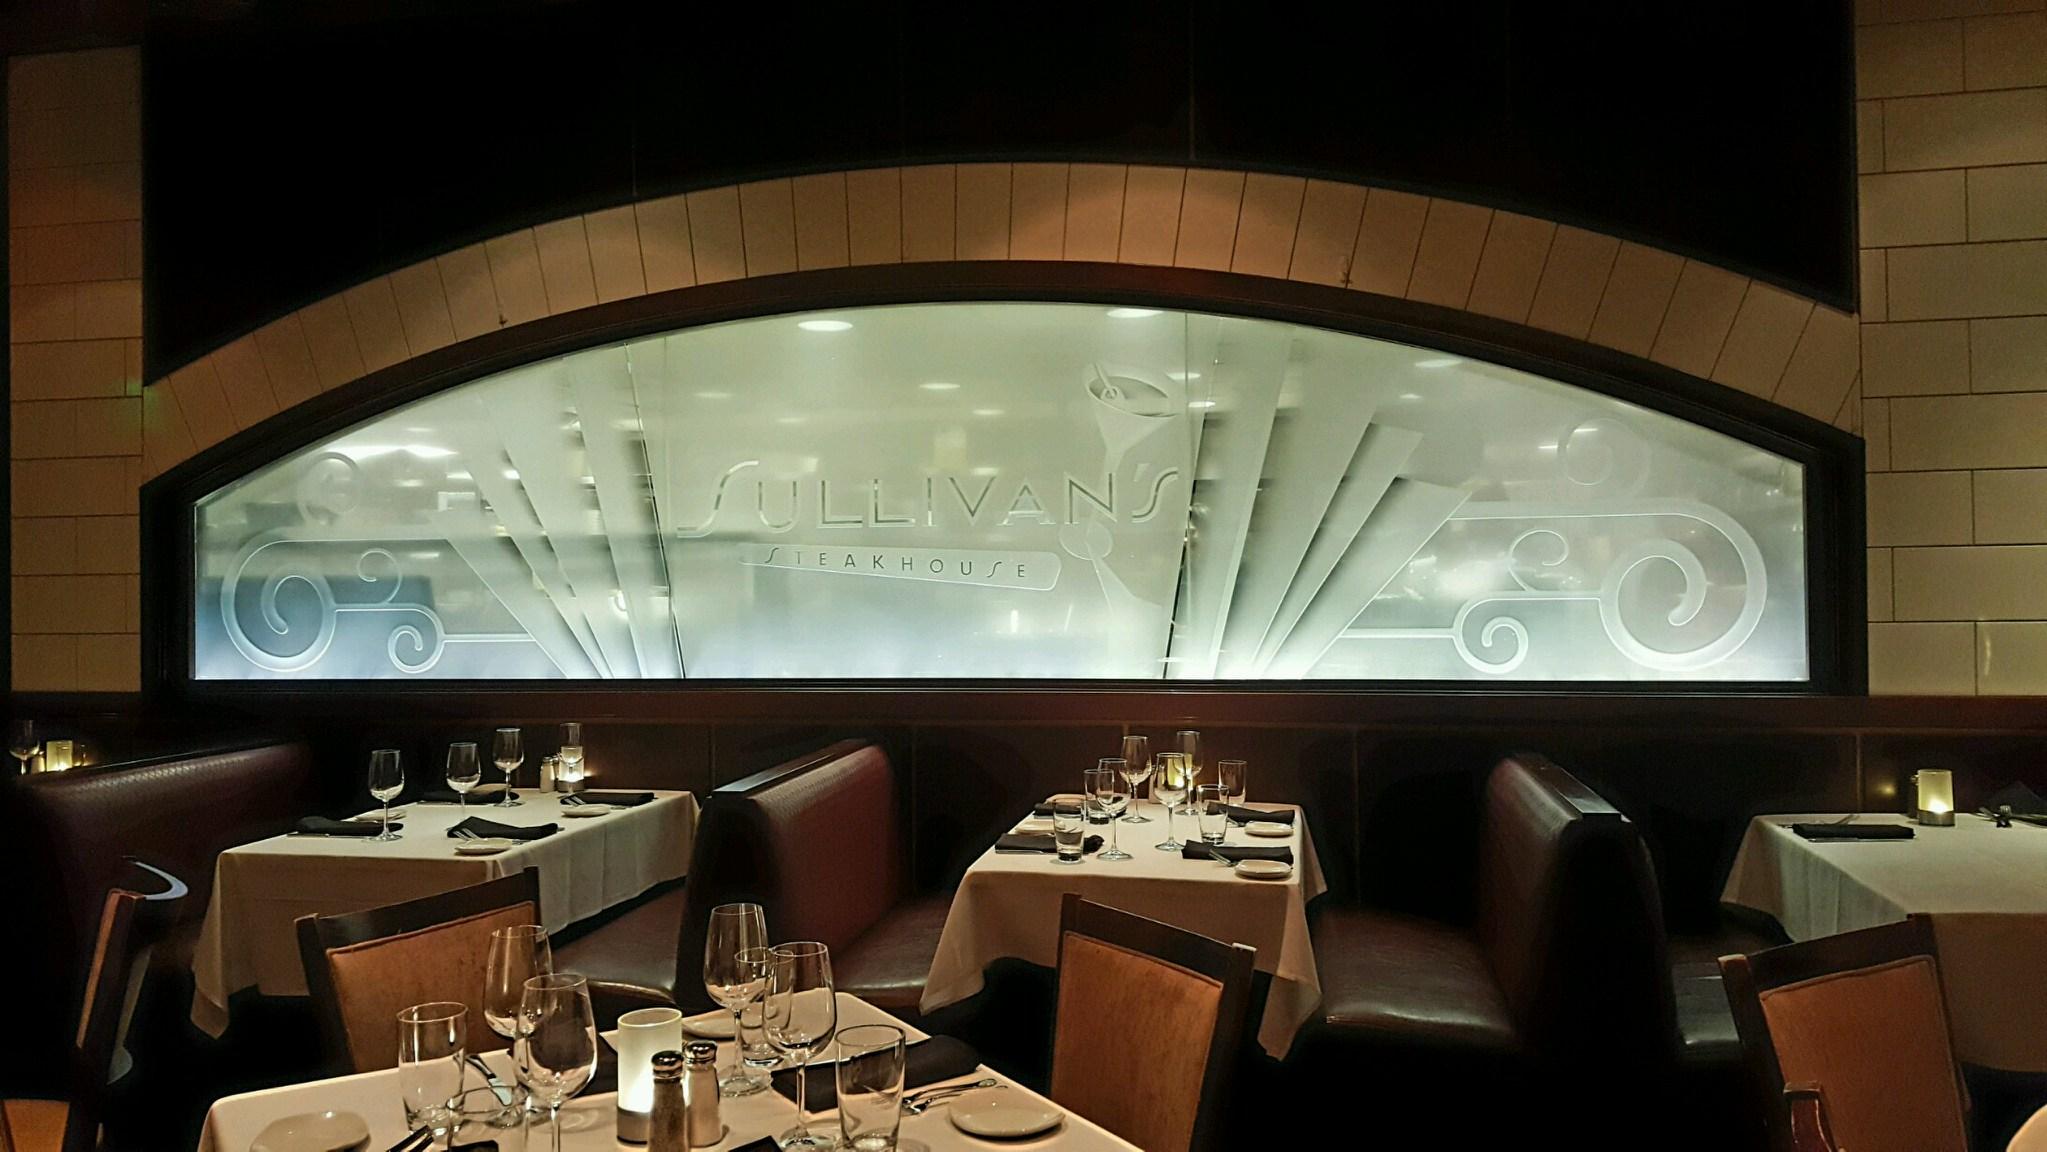 sullivans restaurant seattle wa Sans Soucie Art Glass